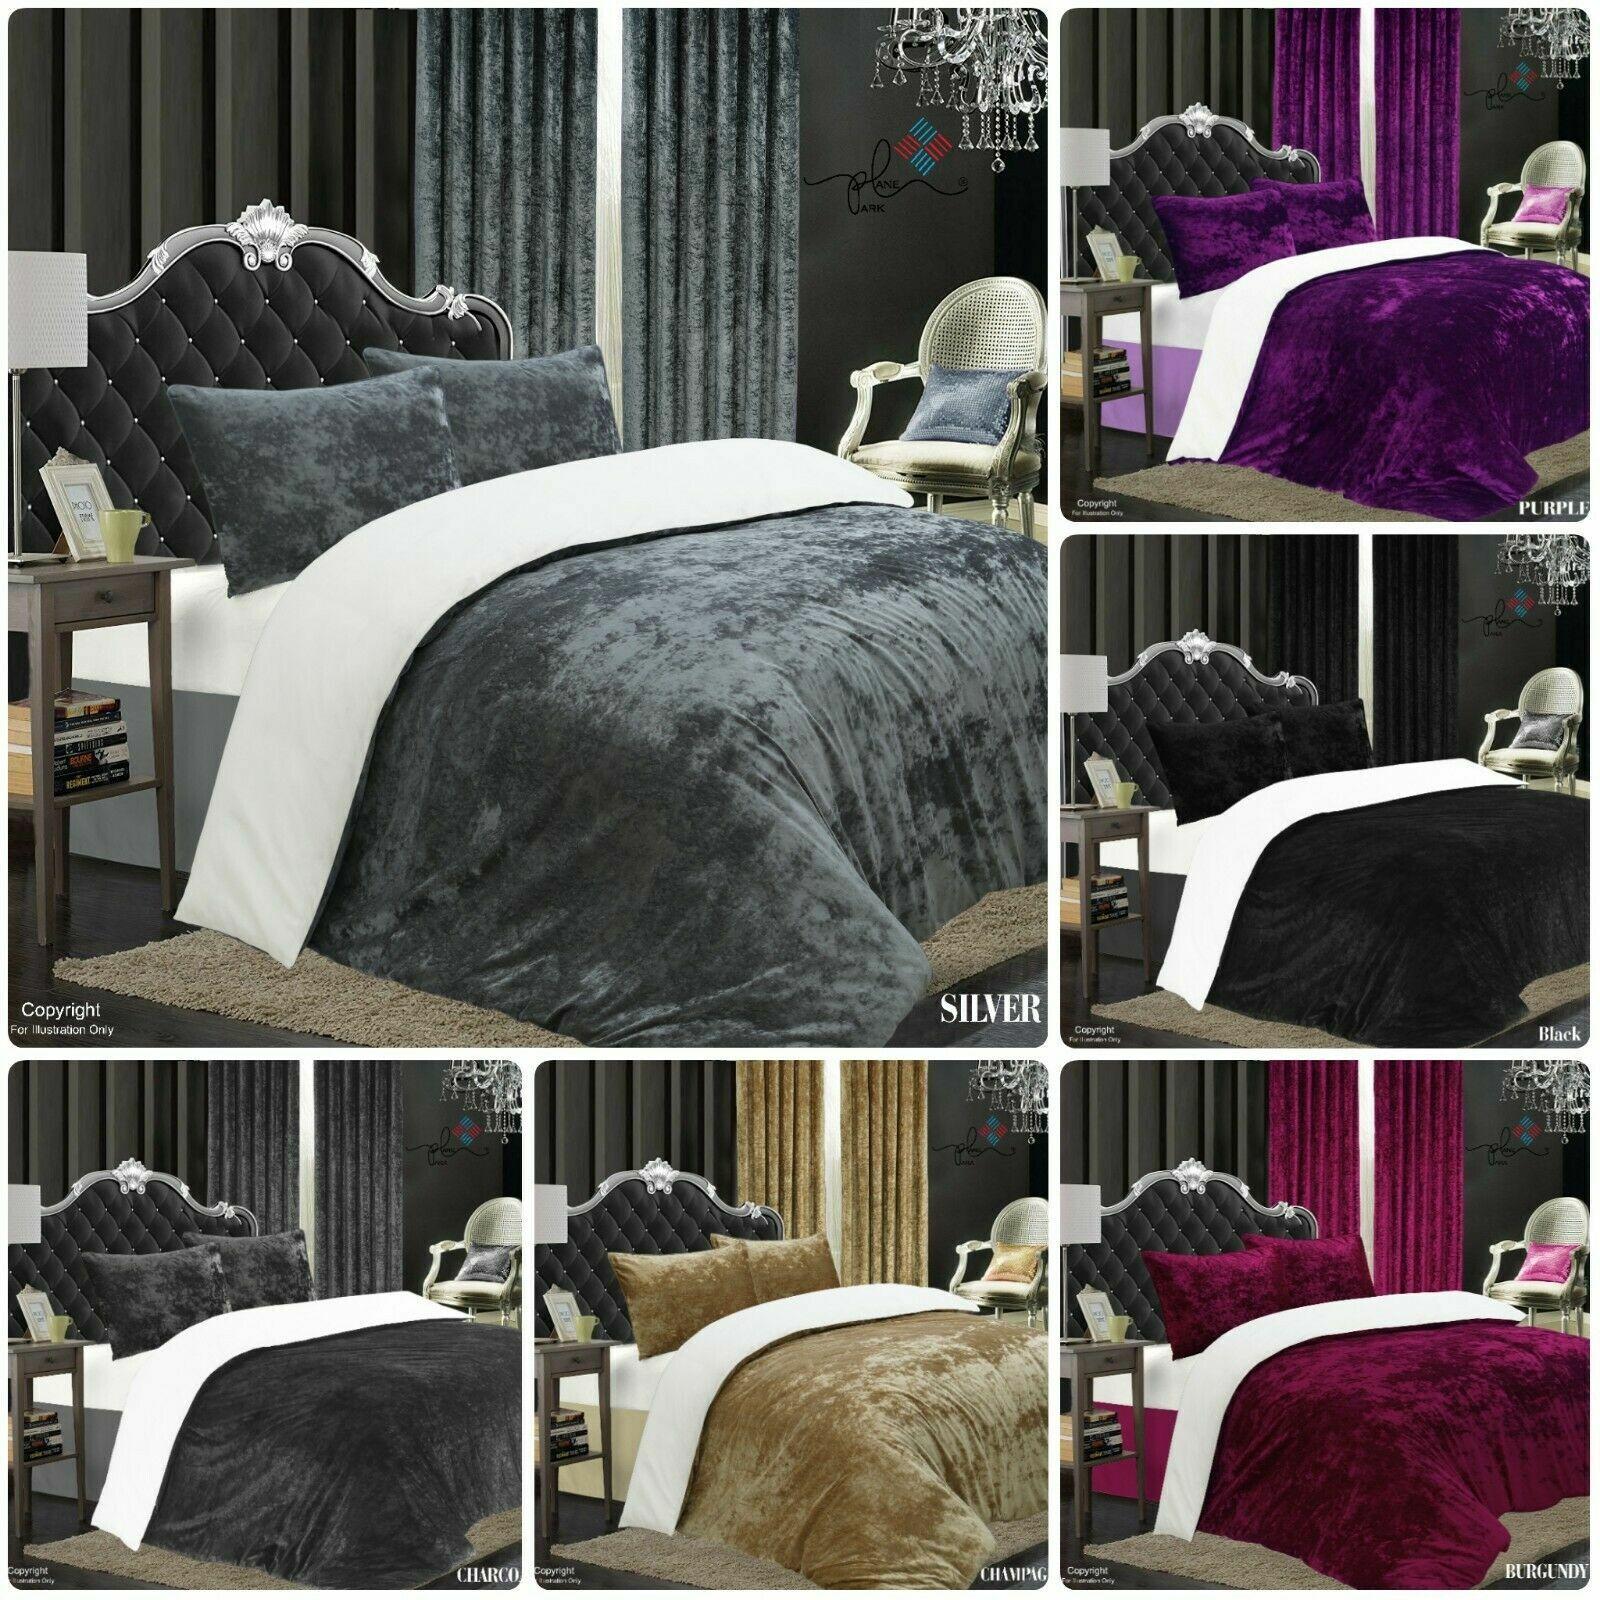 Bedding Eleanor Bedding Set Duvet Cover Pillowcase Luxury Single Double Super King Size Home Furniture Diy Tohoku Morinagamilk Co Jp